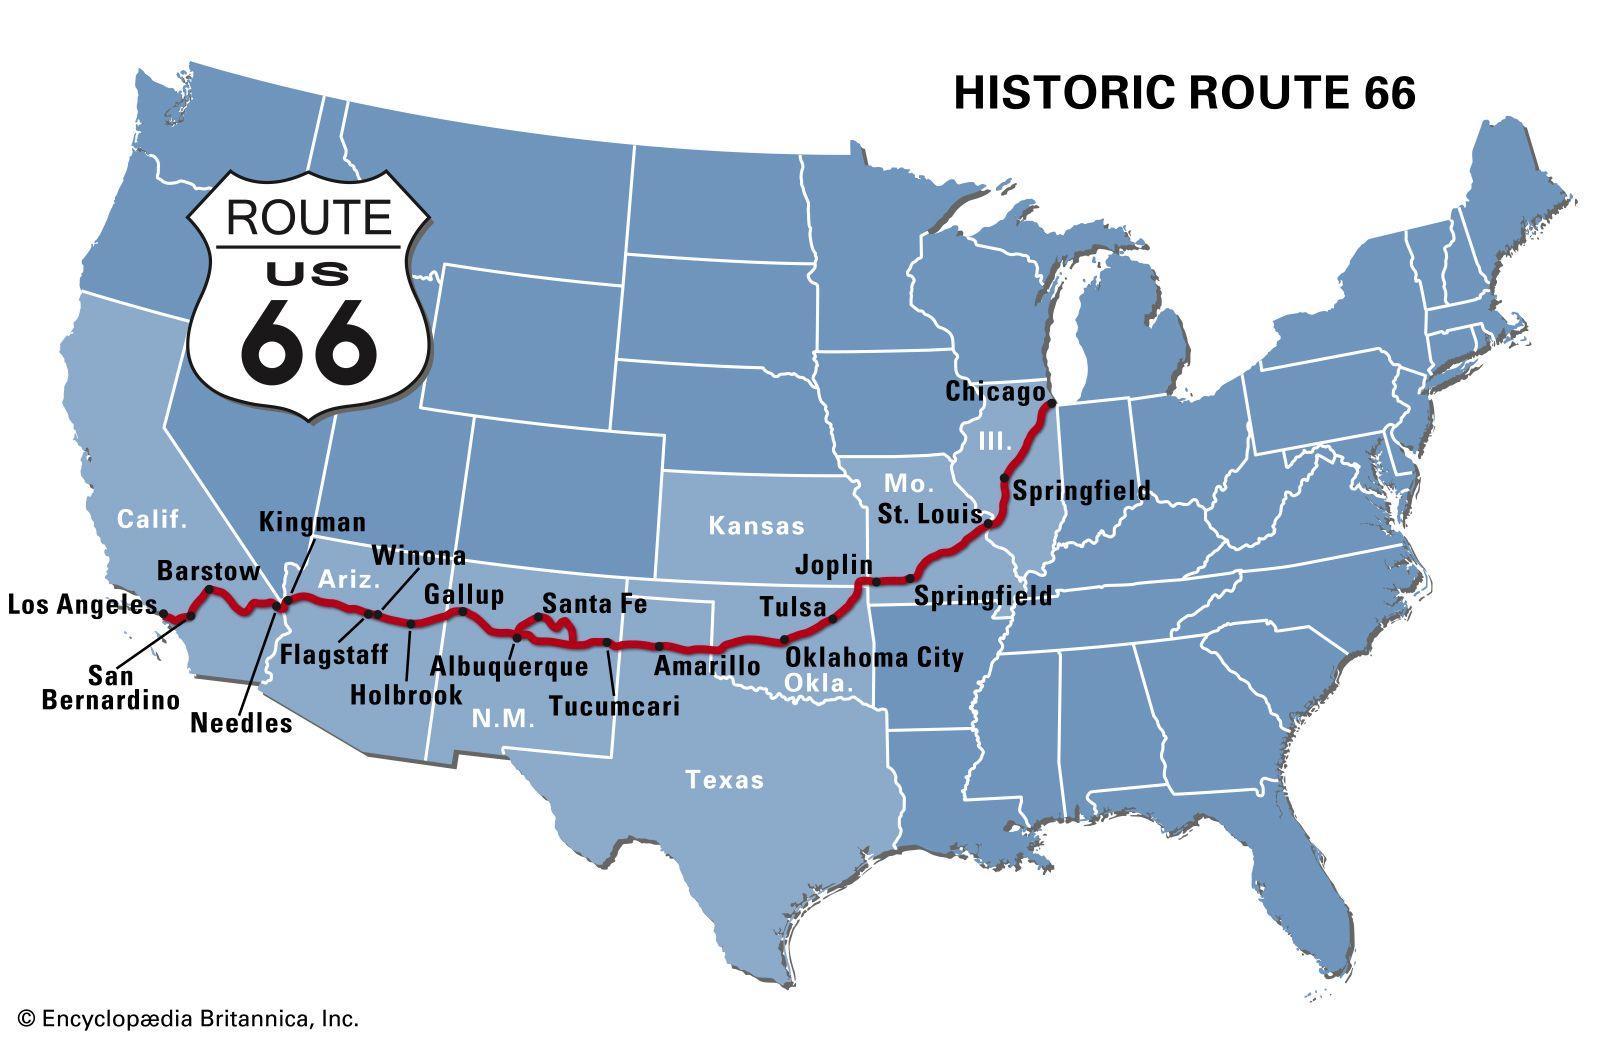 Route 66 | Construction, Popular Culture, & Facts | Britannica